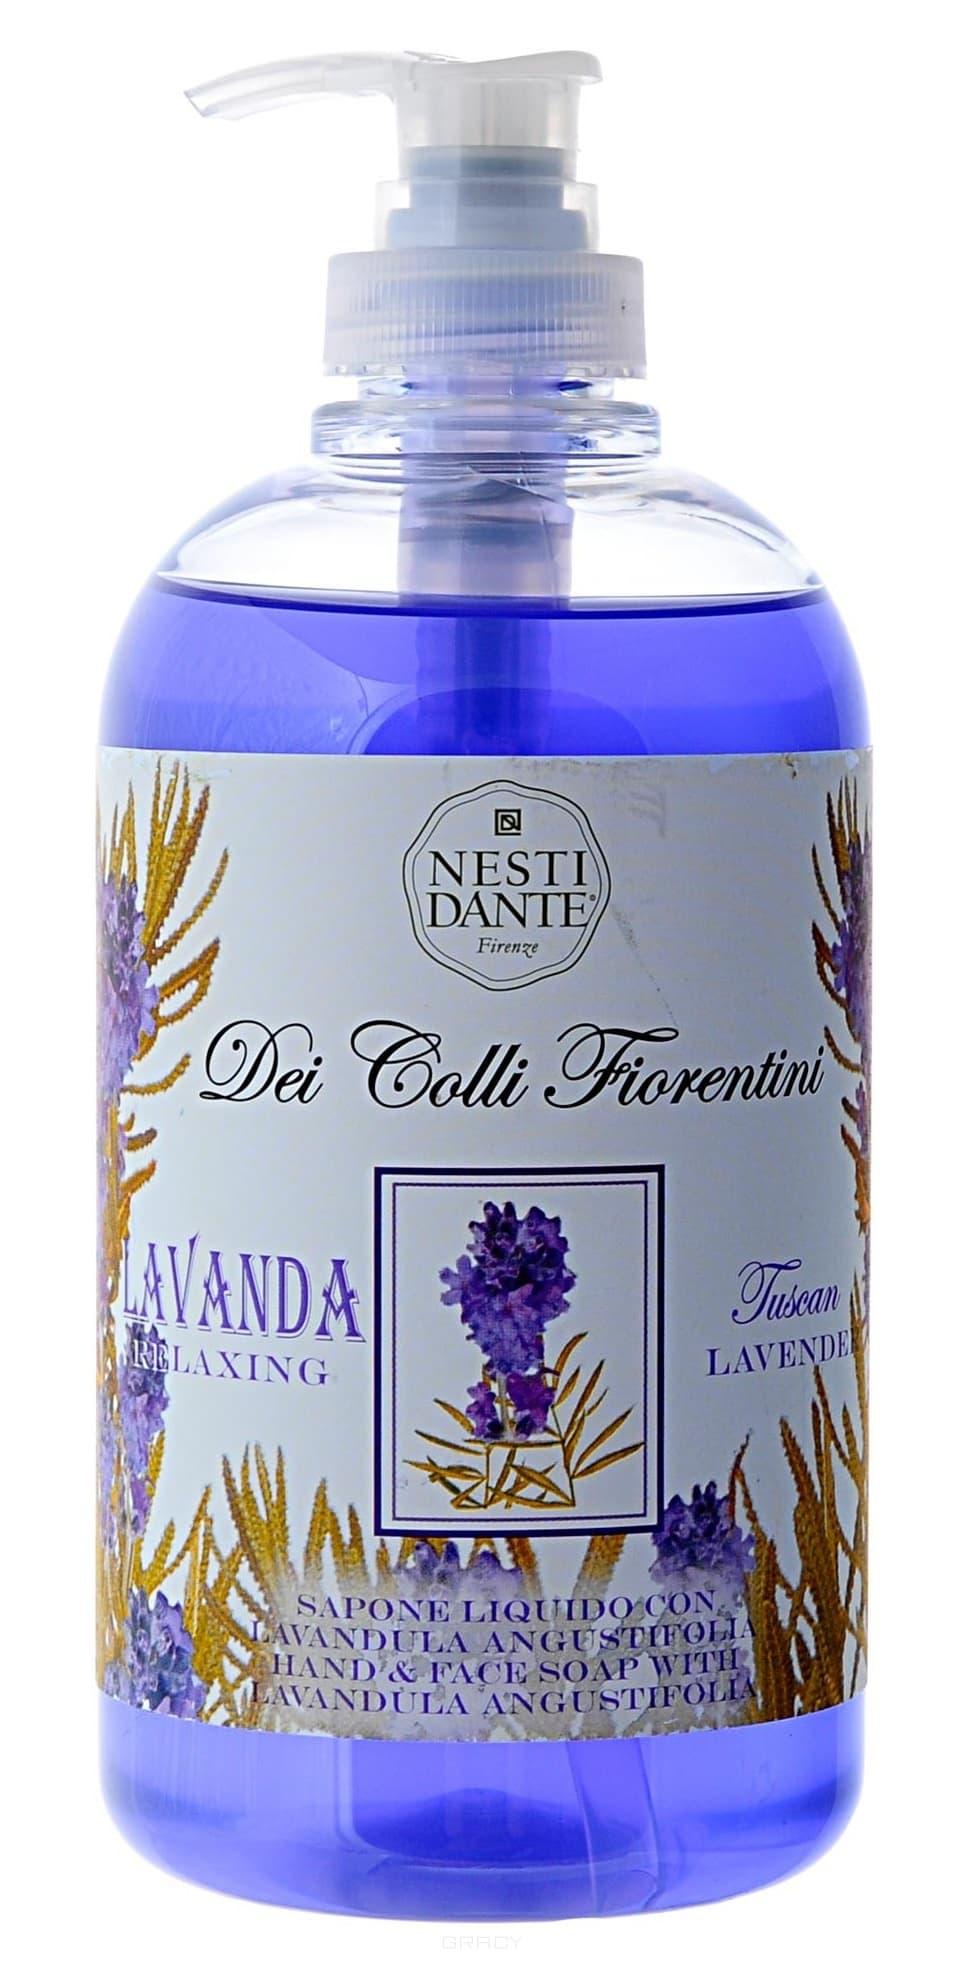 Nesti Dante, Жидкое мыло для рук Тосканская лаванда, 500 млDei Colli Fiorentini - цветочная линия<br><br>